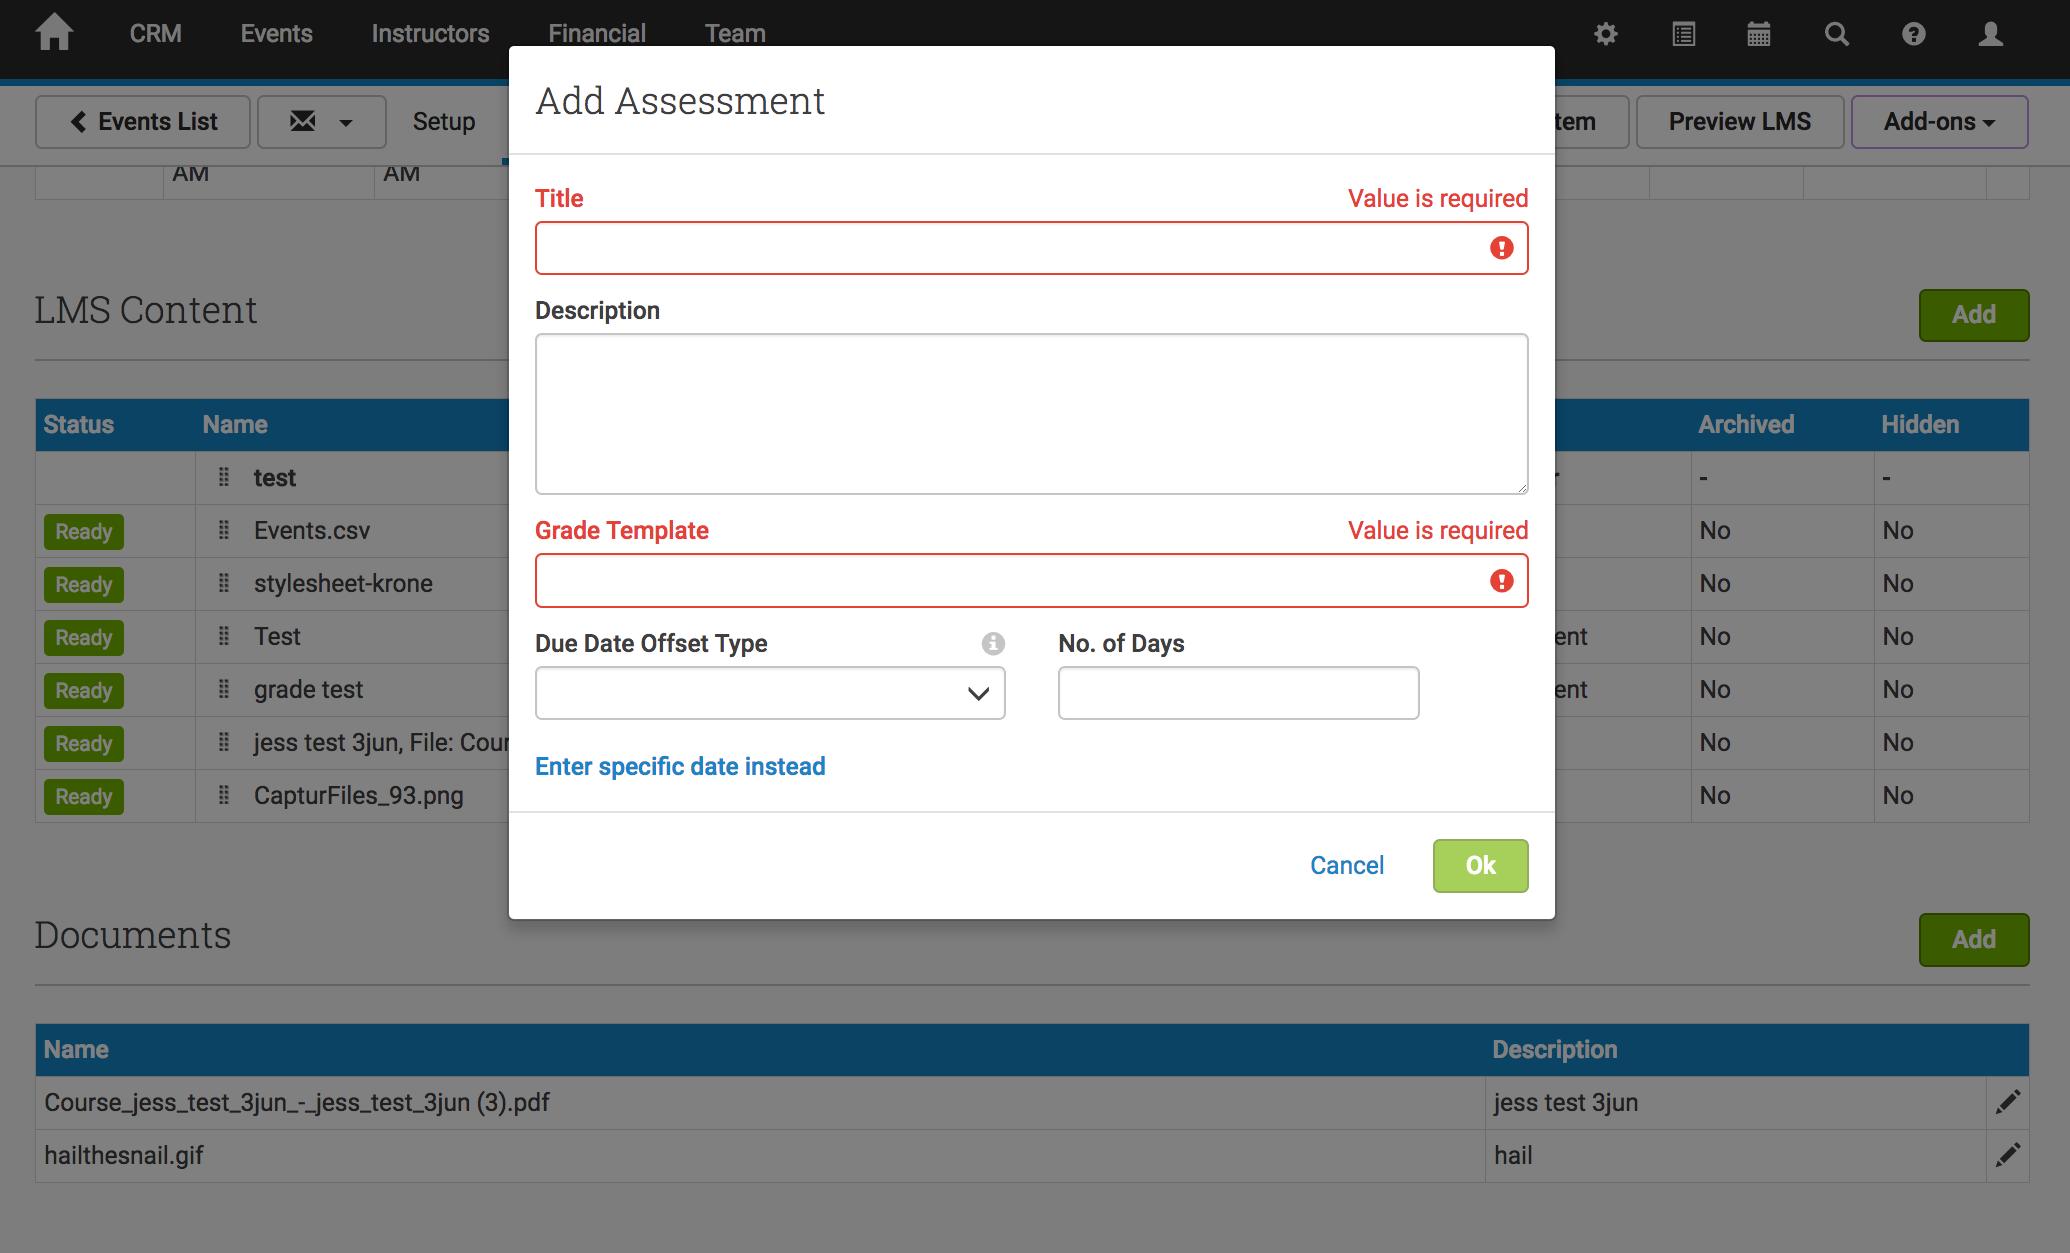 Add assessment